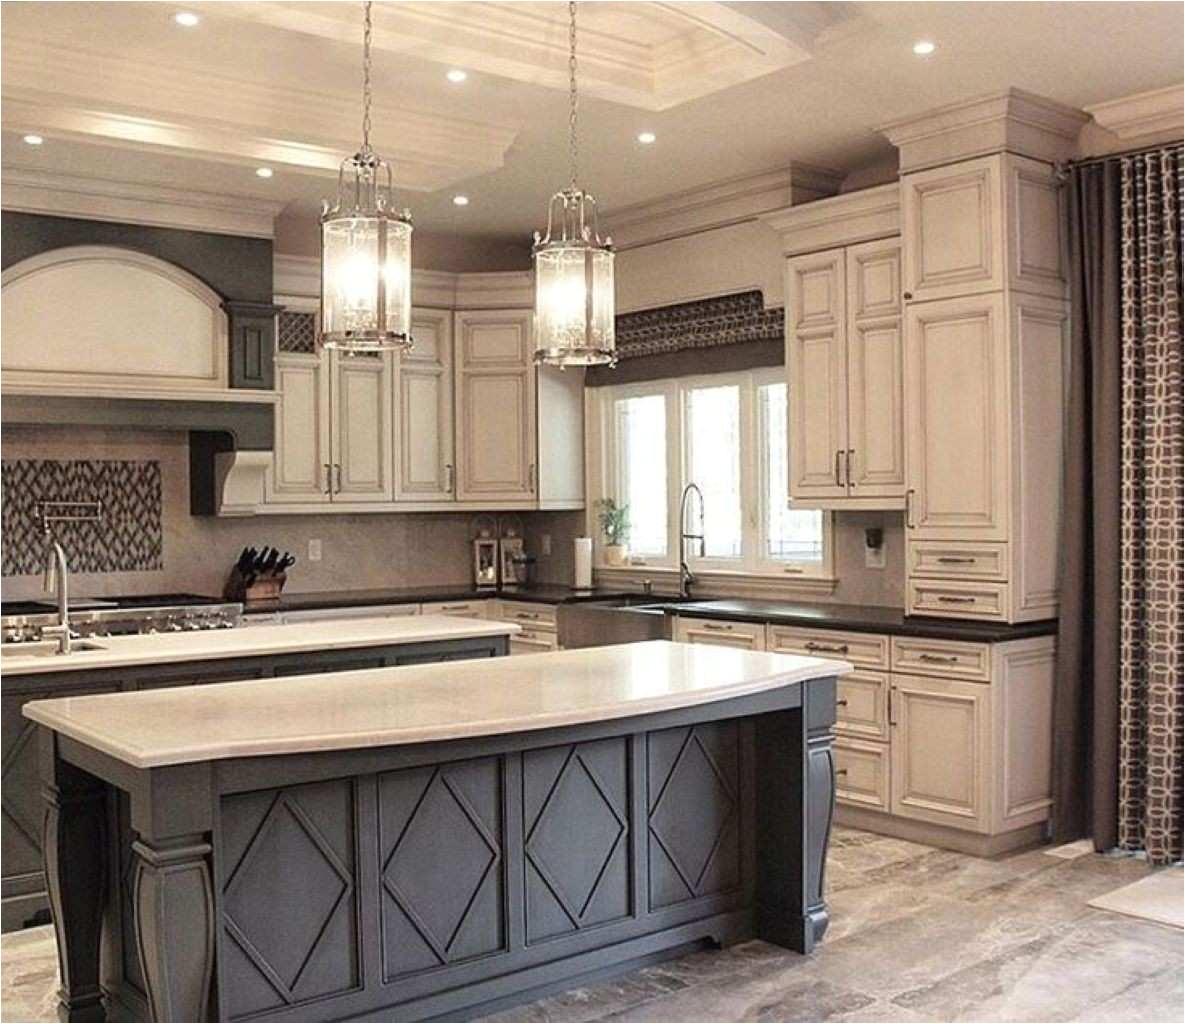 Kitchen Design Ideas Dark Cabinets Beautiful 30 Stunning Diy Kitchen Makeover Ideas Kitchen Design Ideas